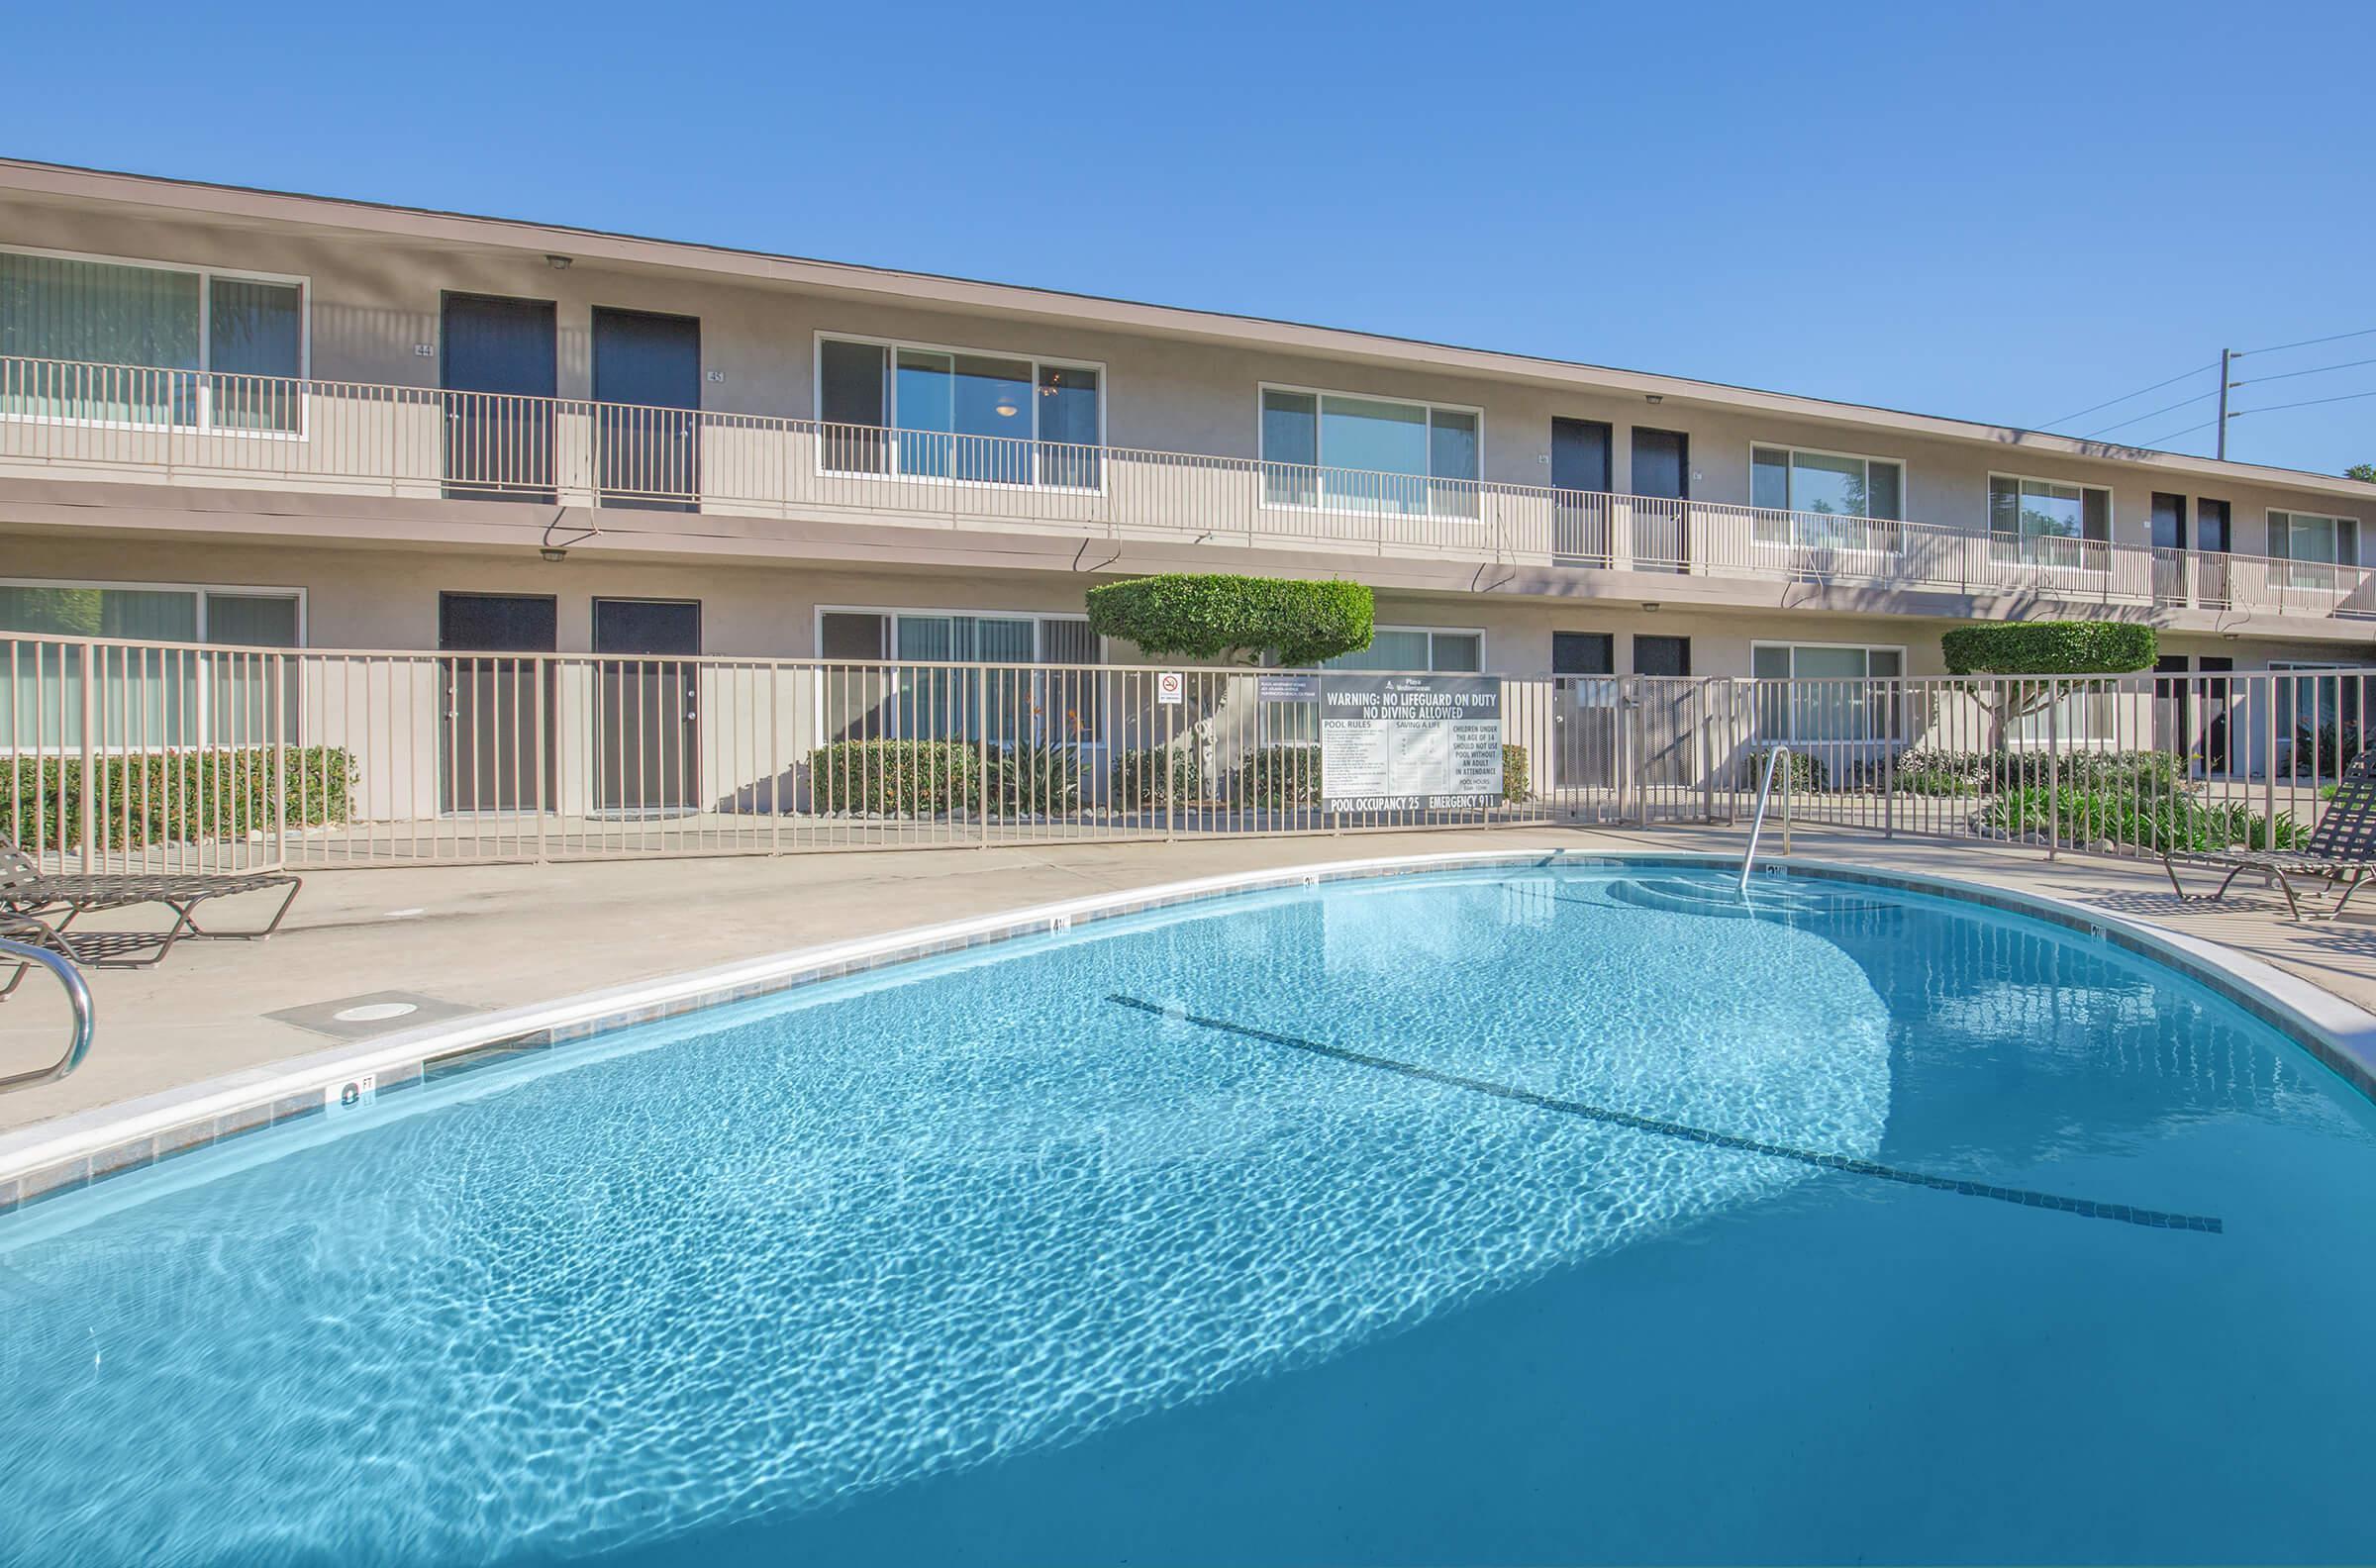 Playa Mediterranean Apartment Homes rental